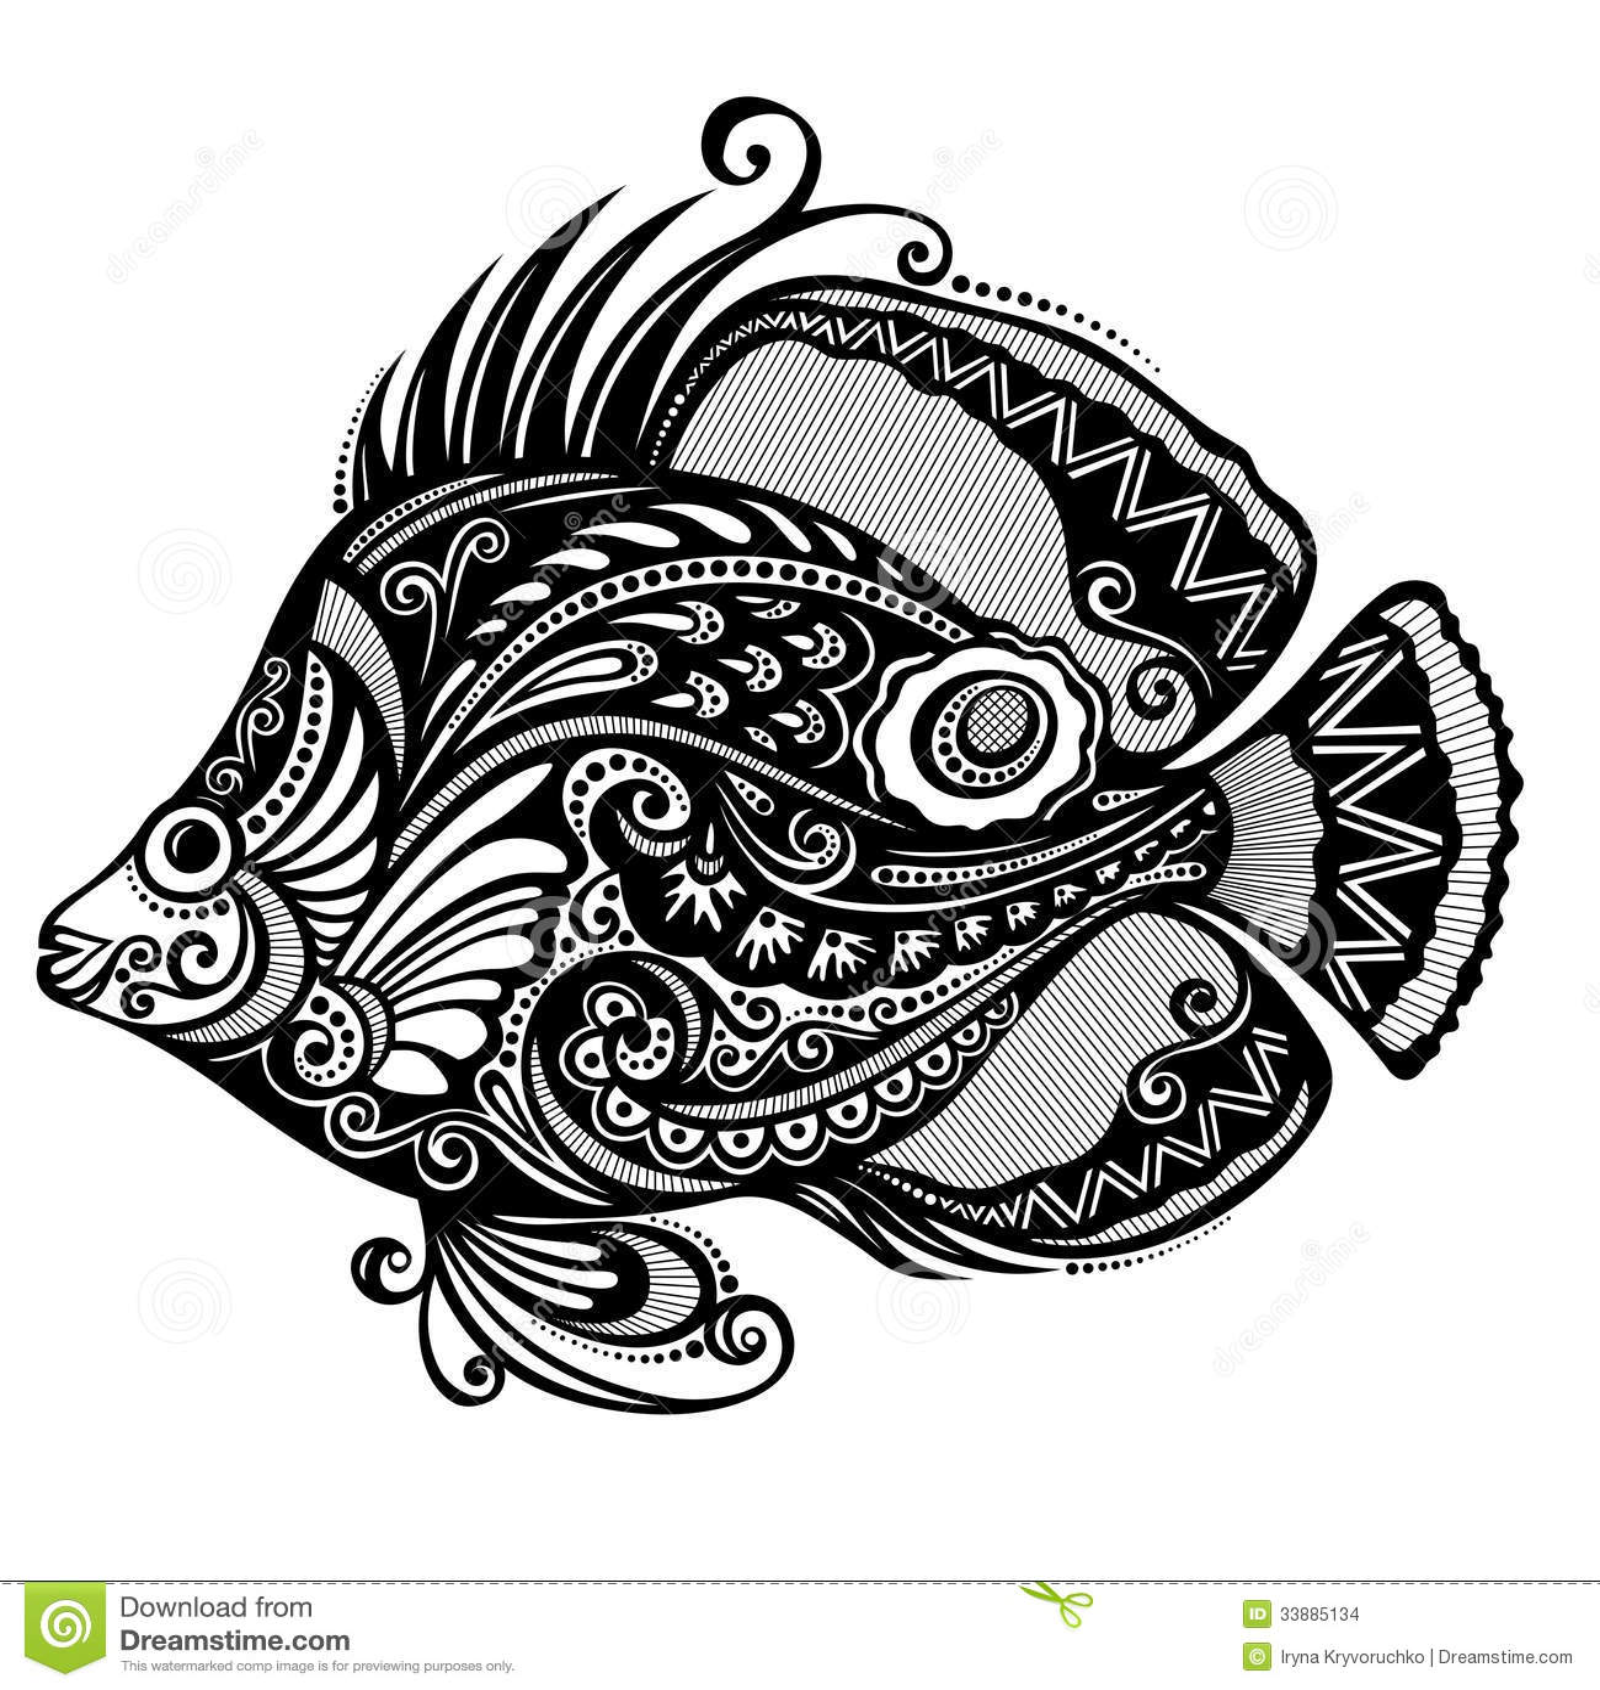 Abstract fish designs - photo#9